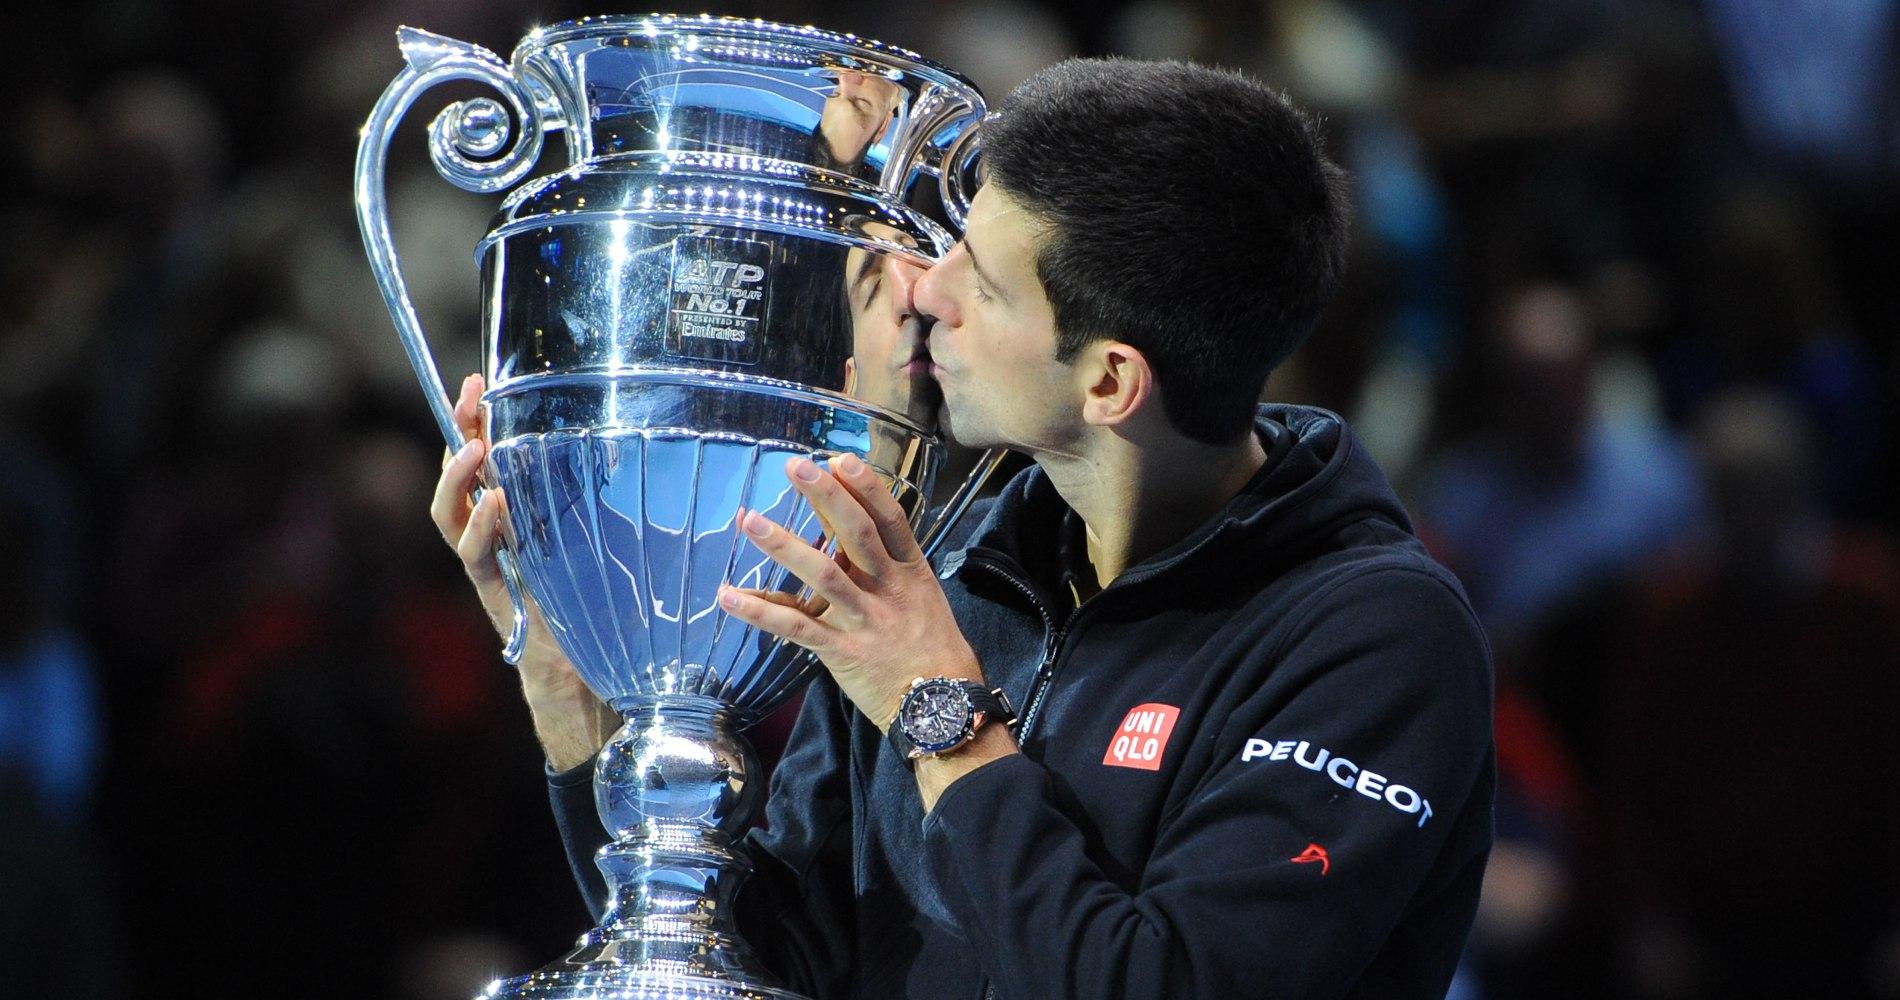 Djokovic ATP Finals 2014